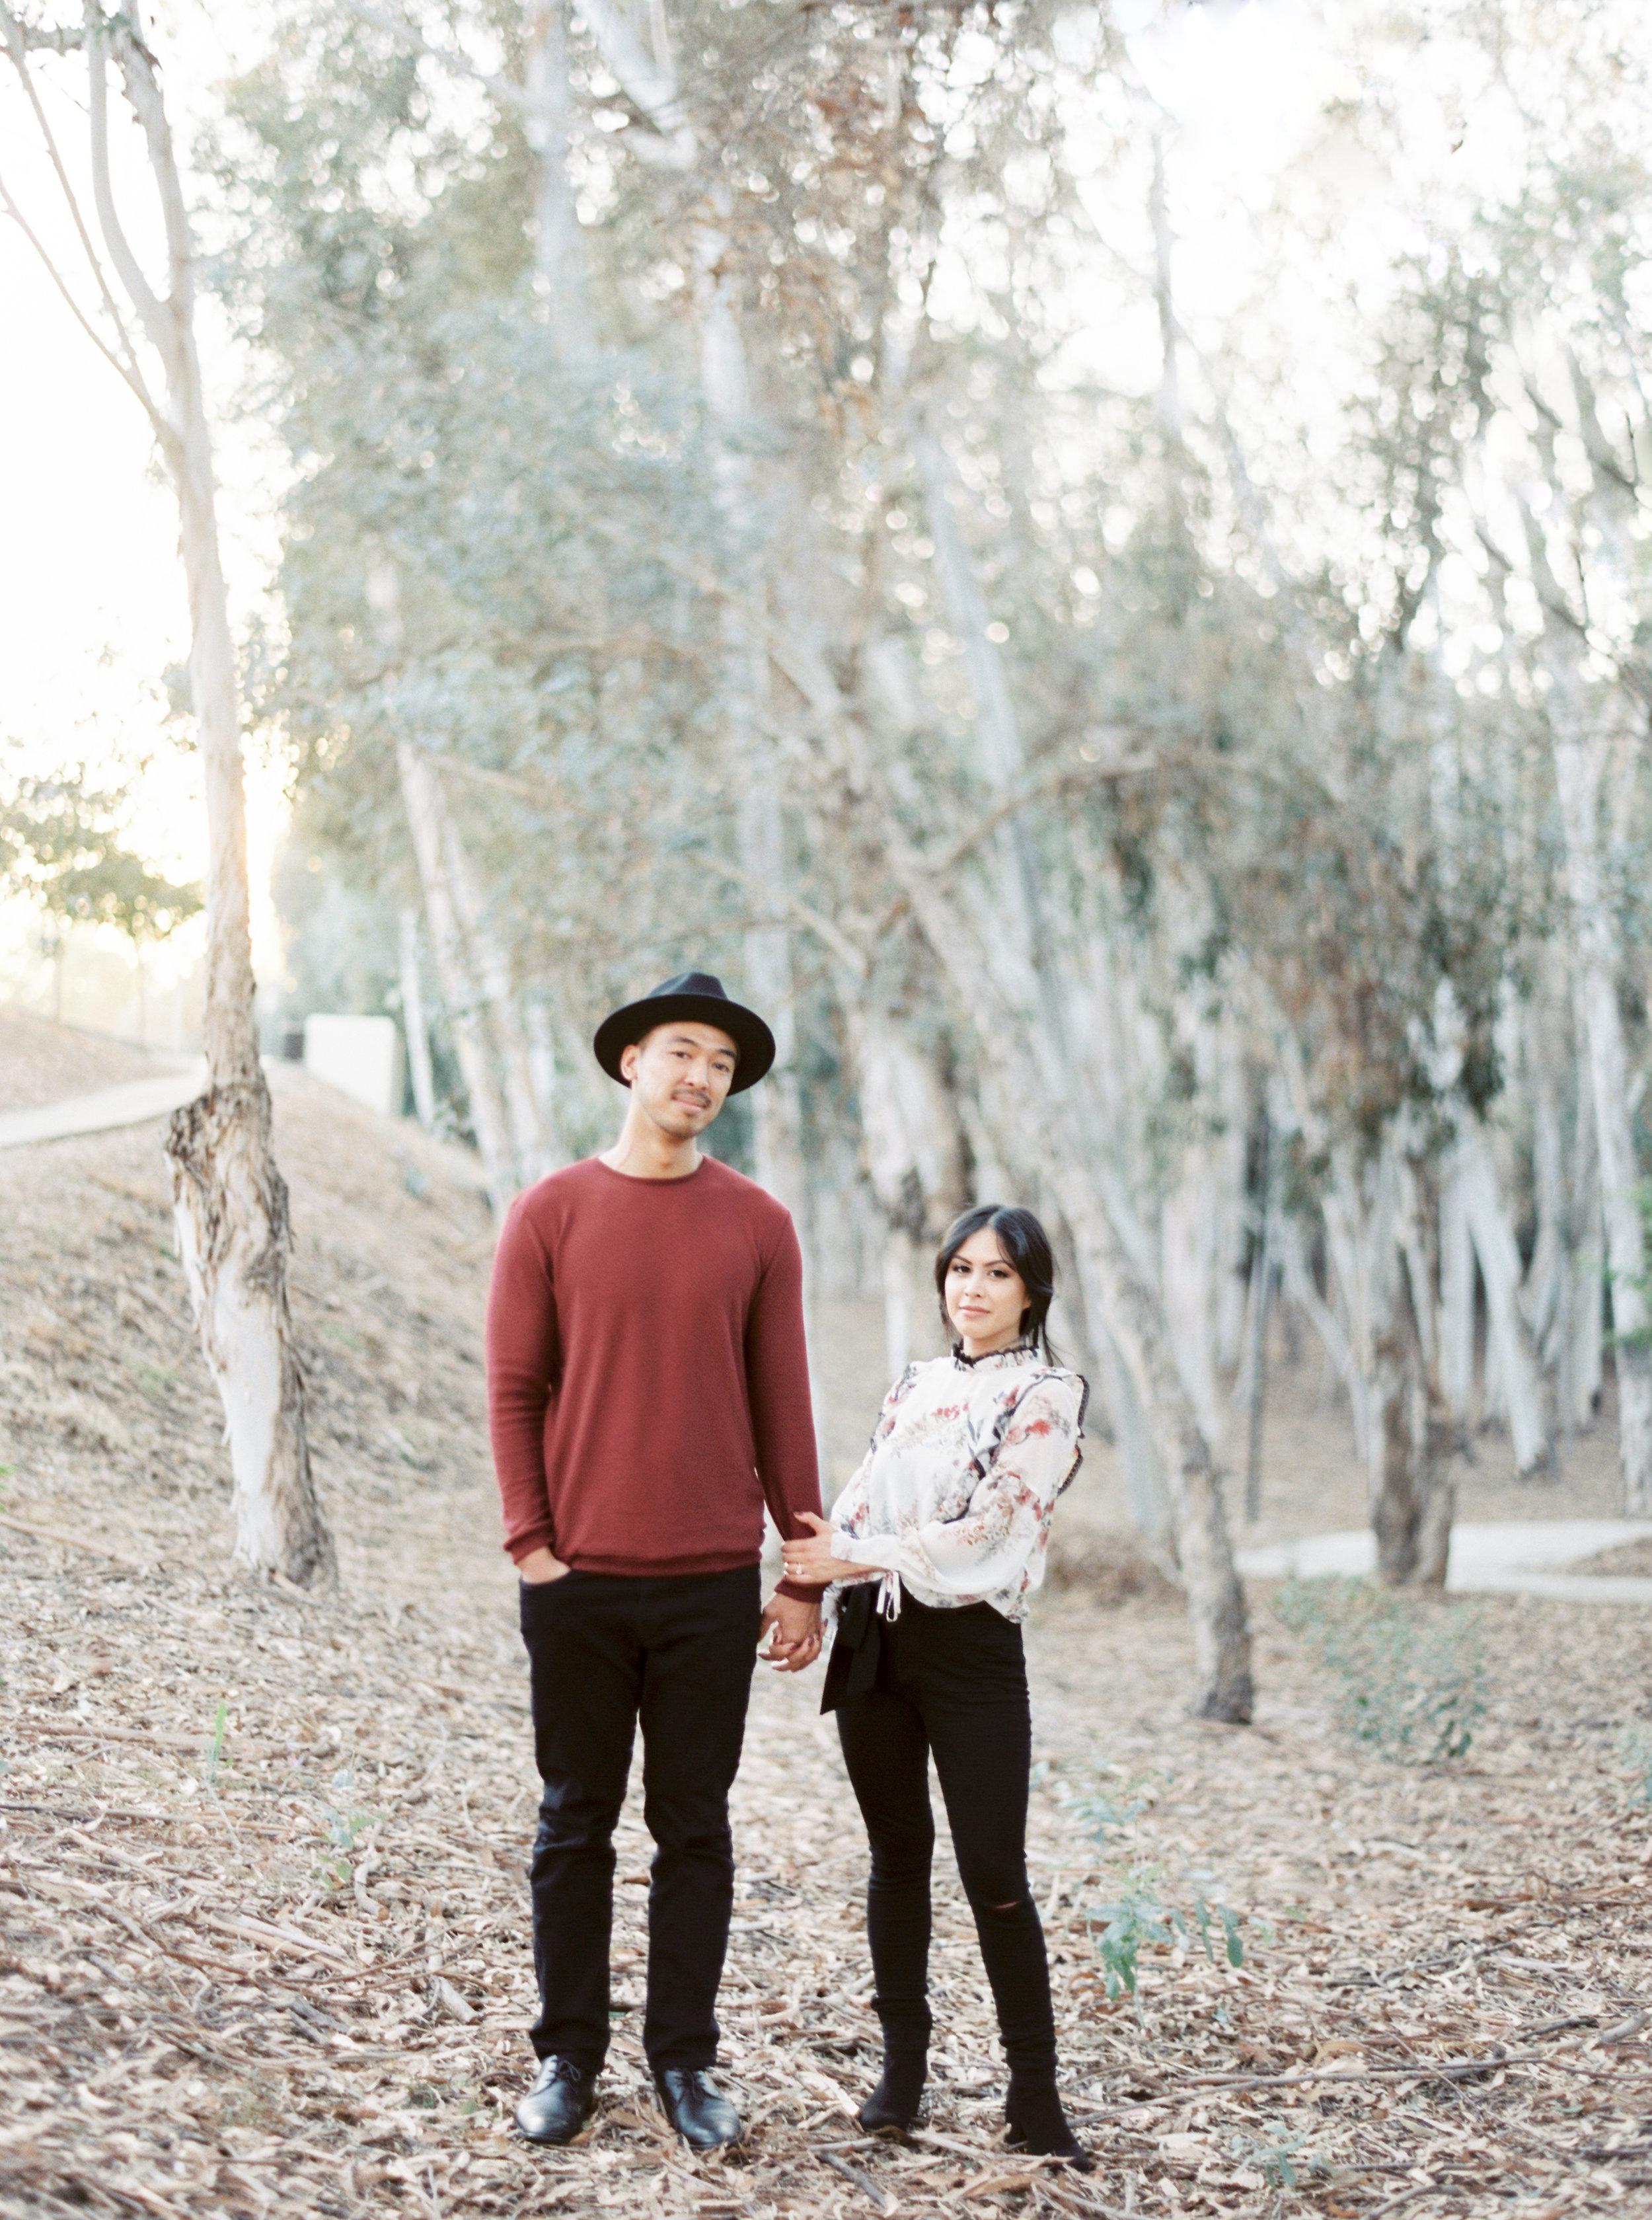 Anniversary Session | Hipster Engagement Session | Fine Art Engagement Session | Savan Photography | California Photographer | Fine Art Wedding Blog | Canadian Wedding Blog | Joy Wed